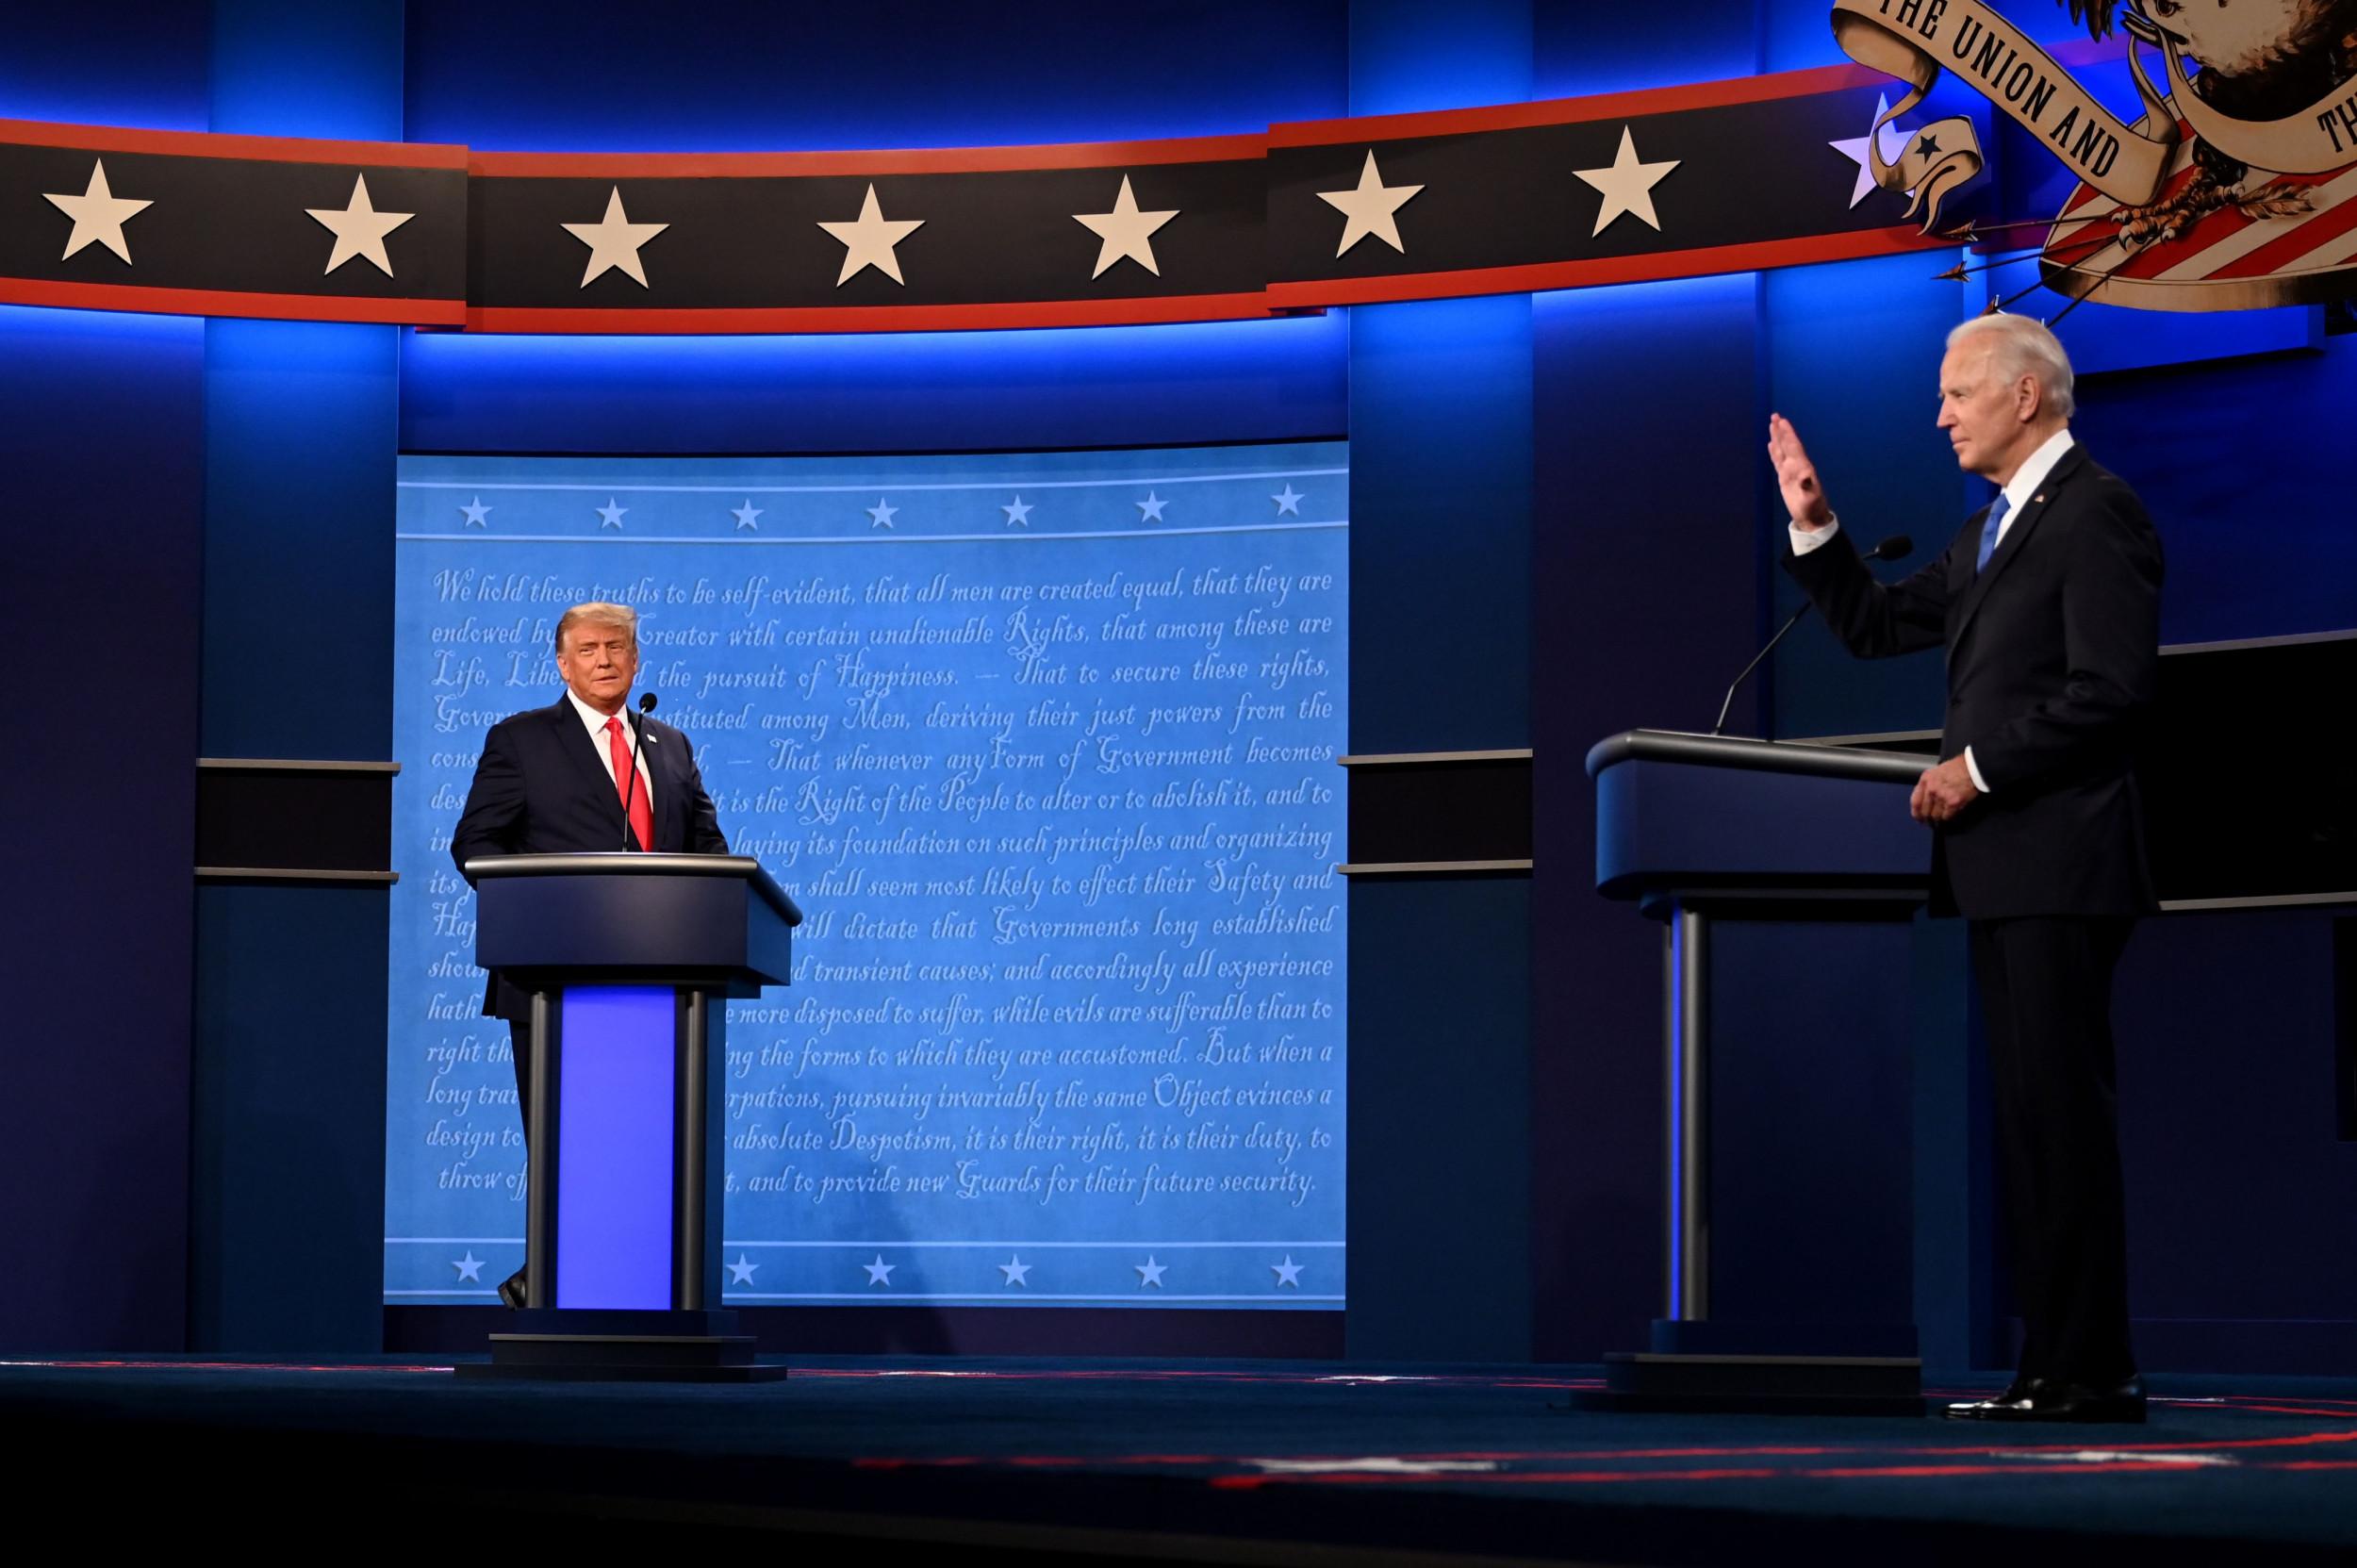 How Bette Midler, Kirstie Alley and other celebs reacted to final debate between Trump and Biden